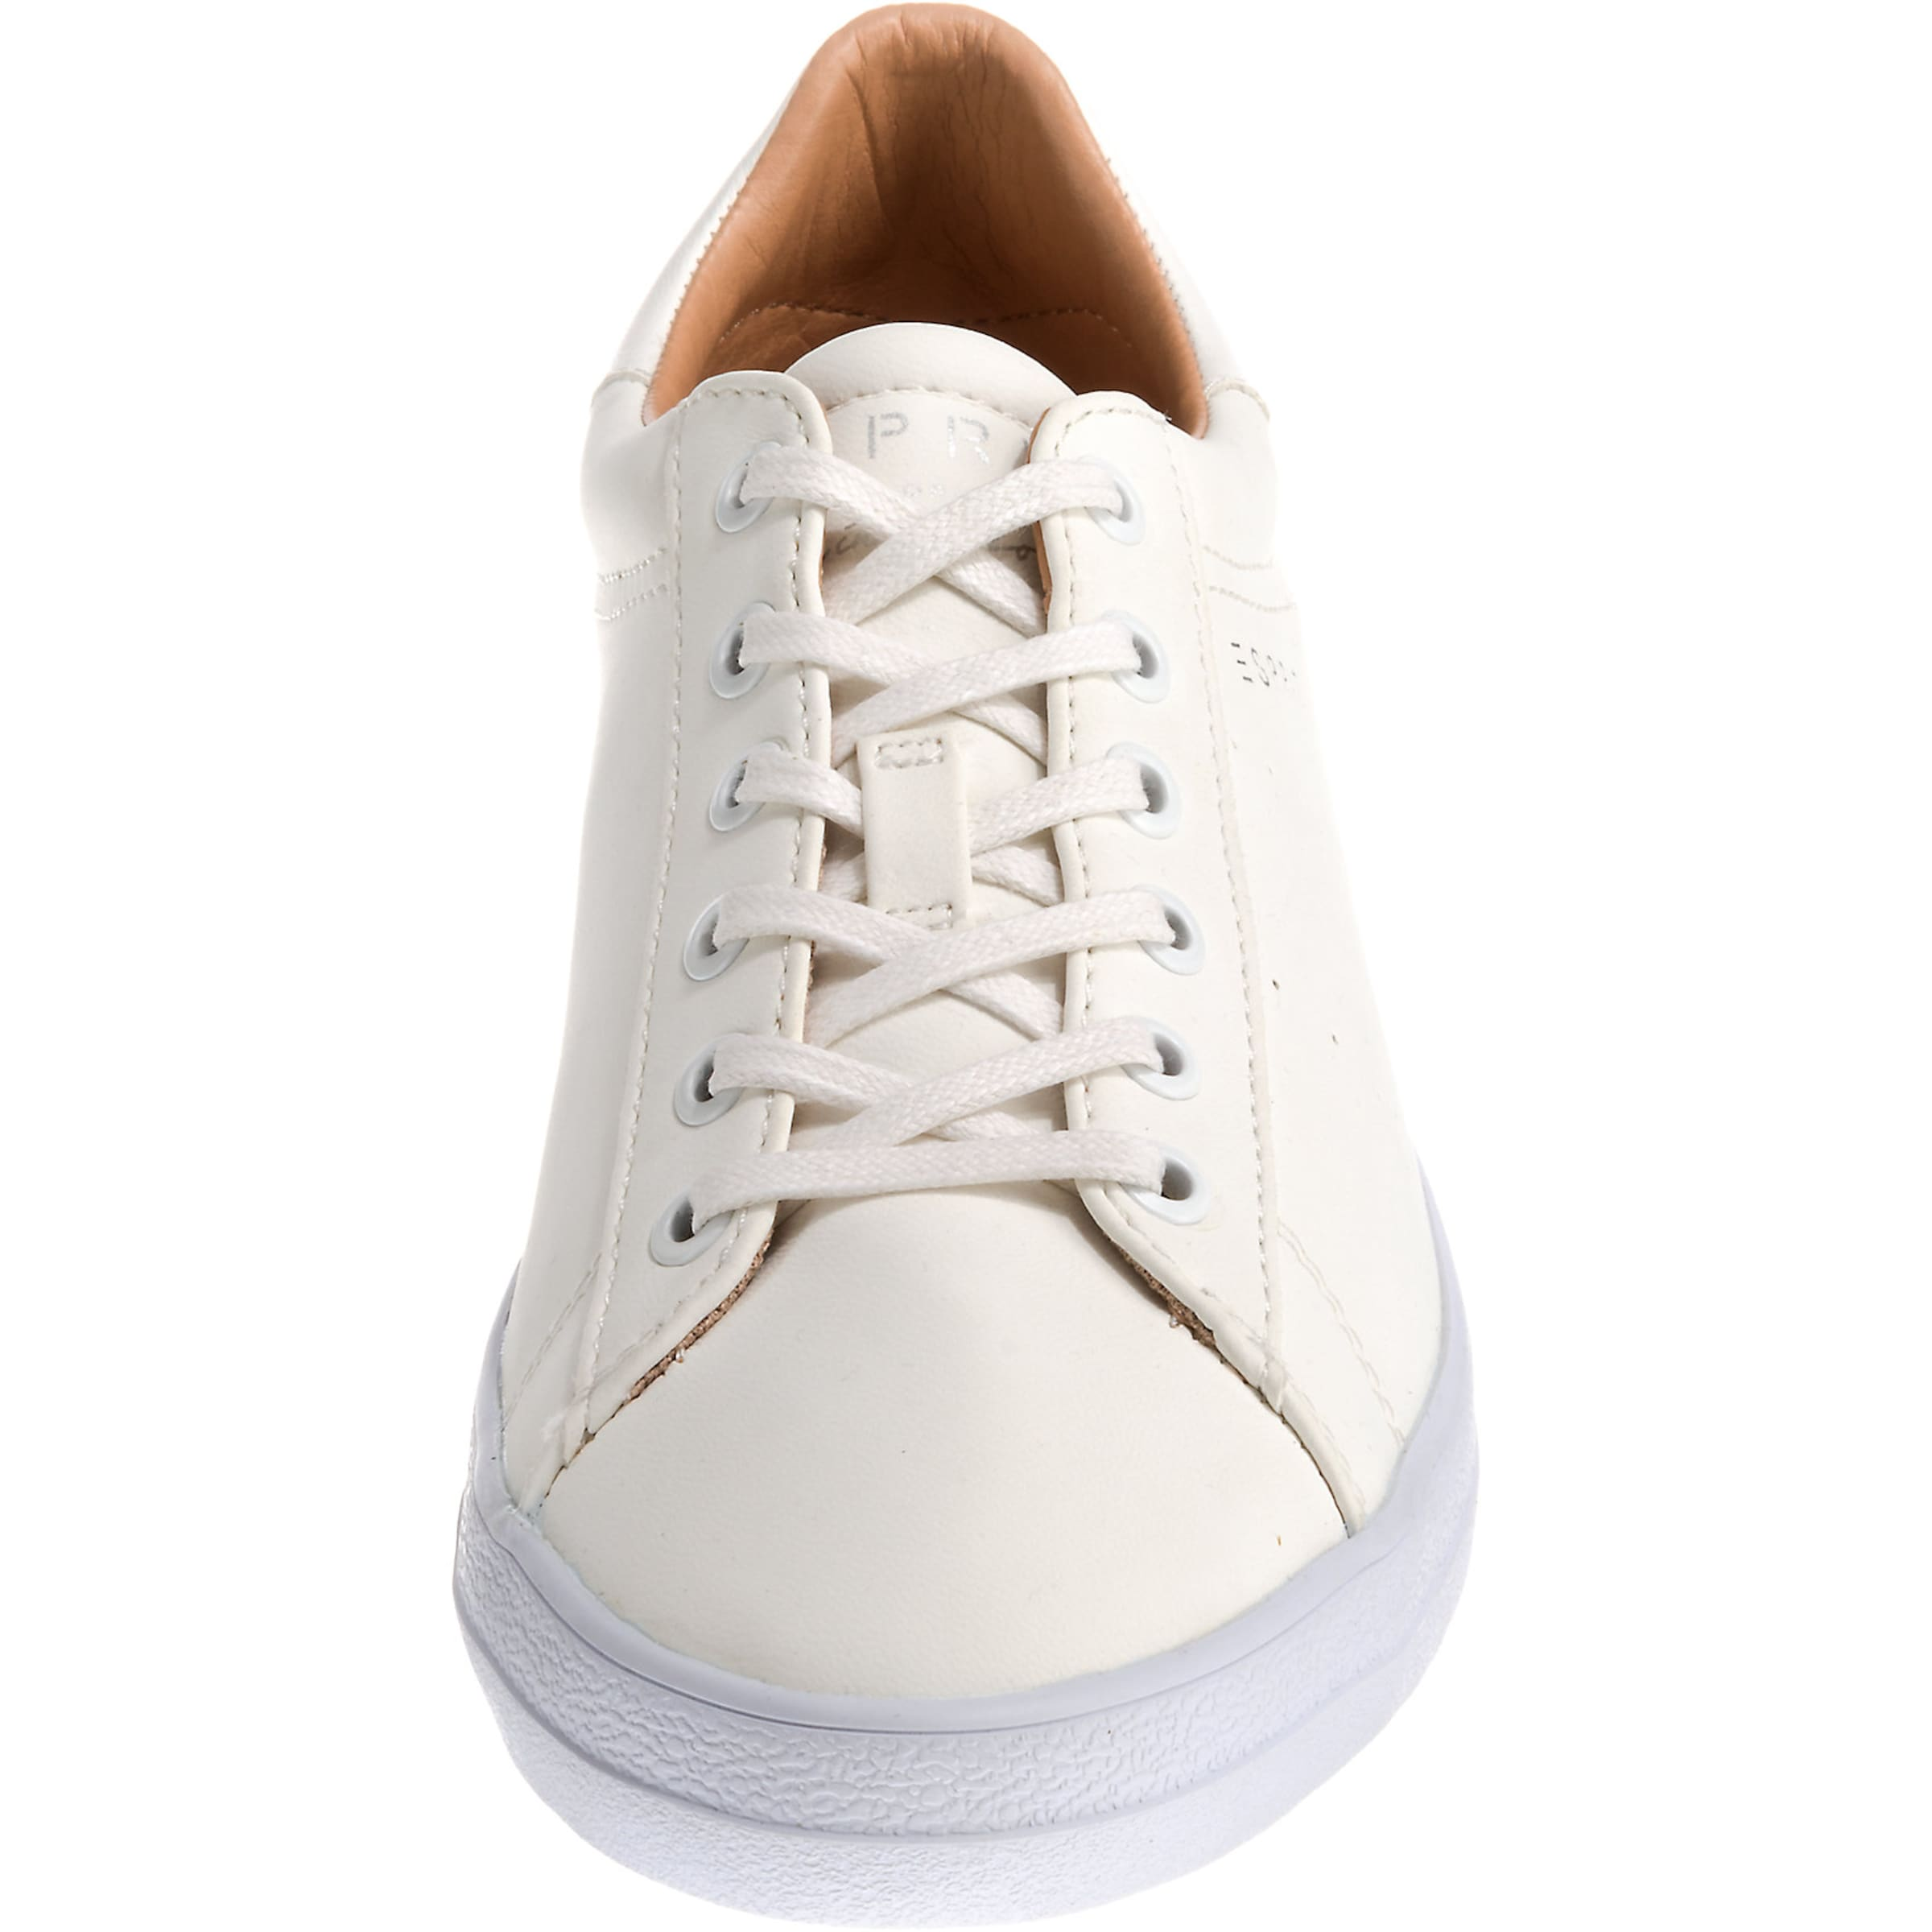 Esprit Sneaker Offwhite 'miana In Up' Lace QroEdWxCBe